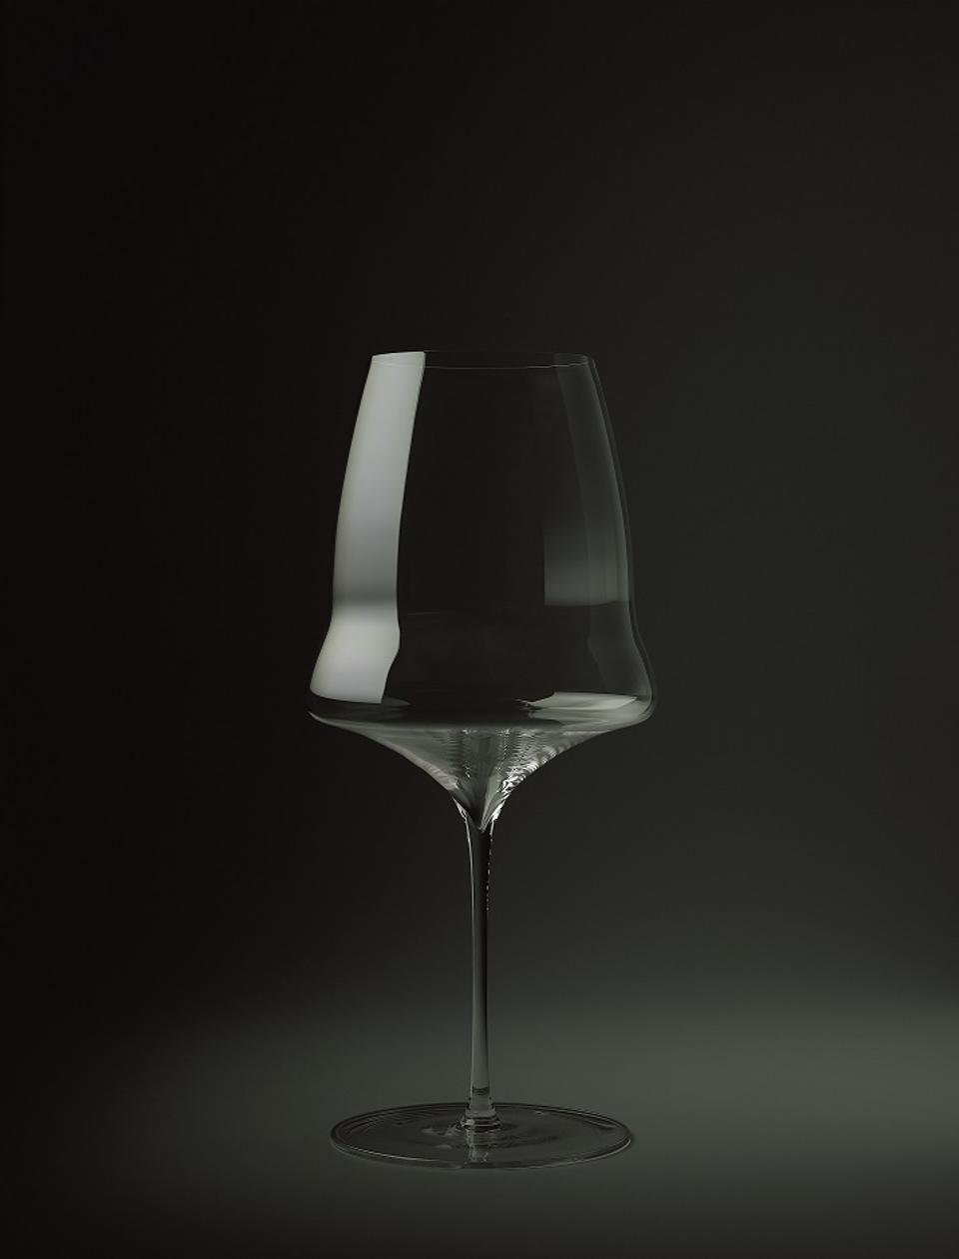 Bordeaux glasses designed by Kurt Zalto